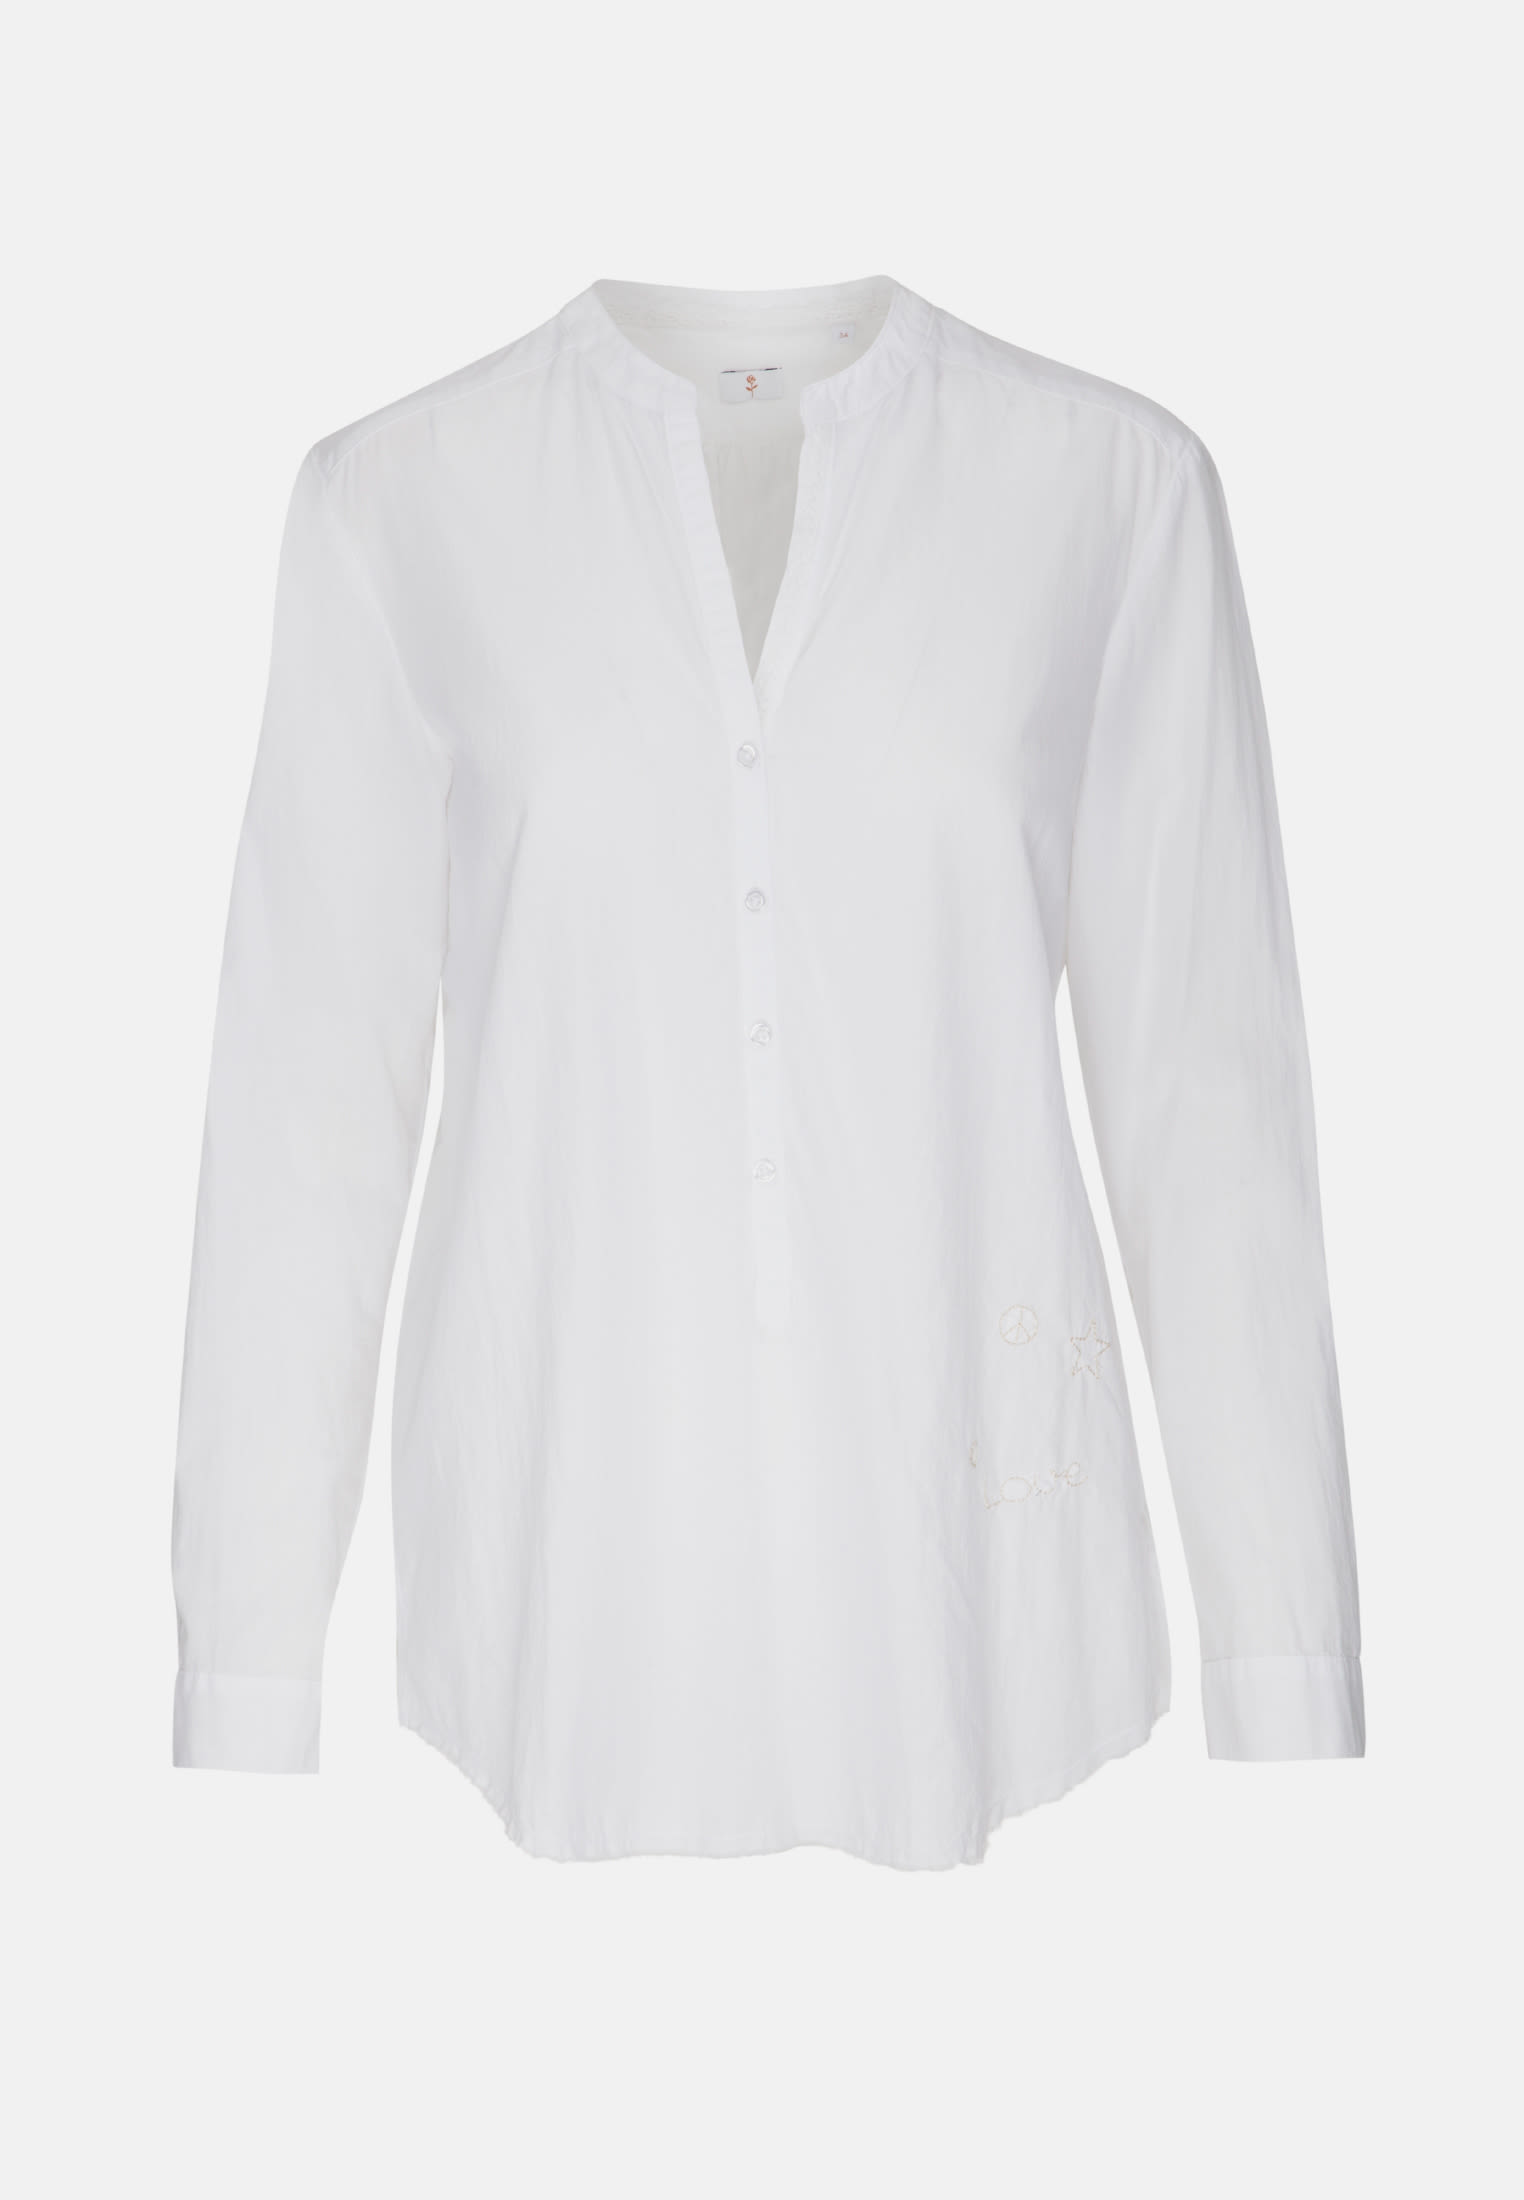 Voile Tunic made of 100% Cotton in White |  Seidensticker Onlineshop